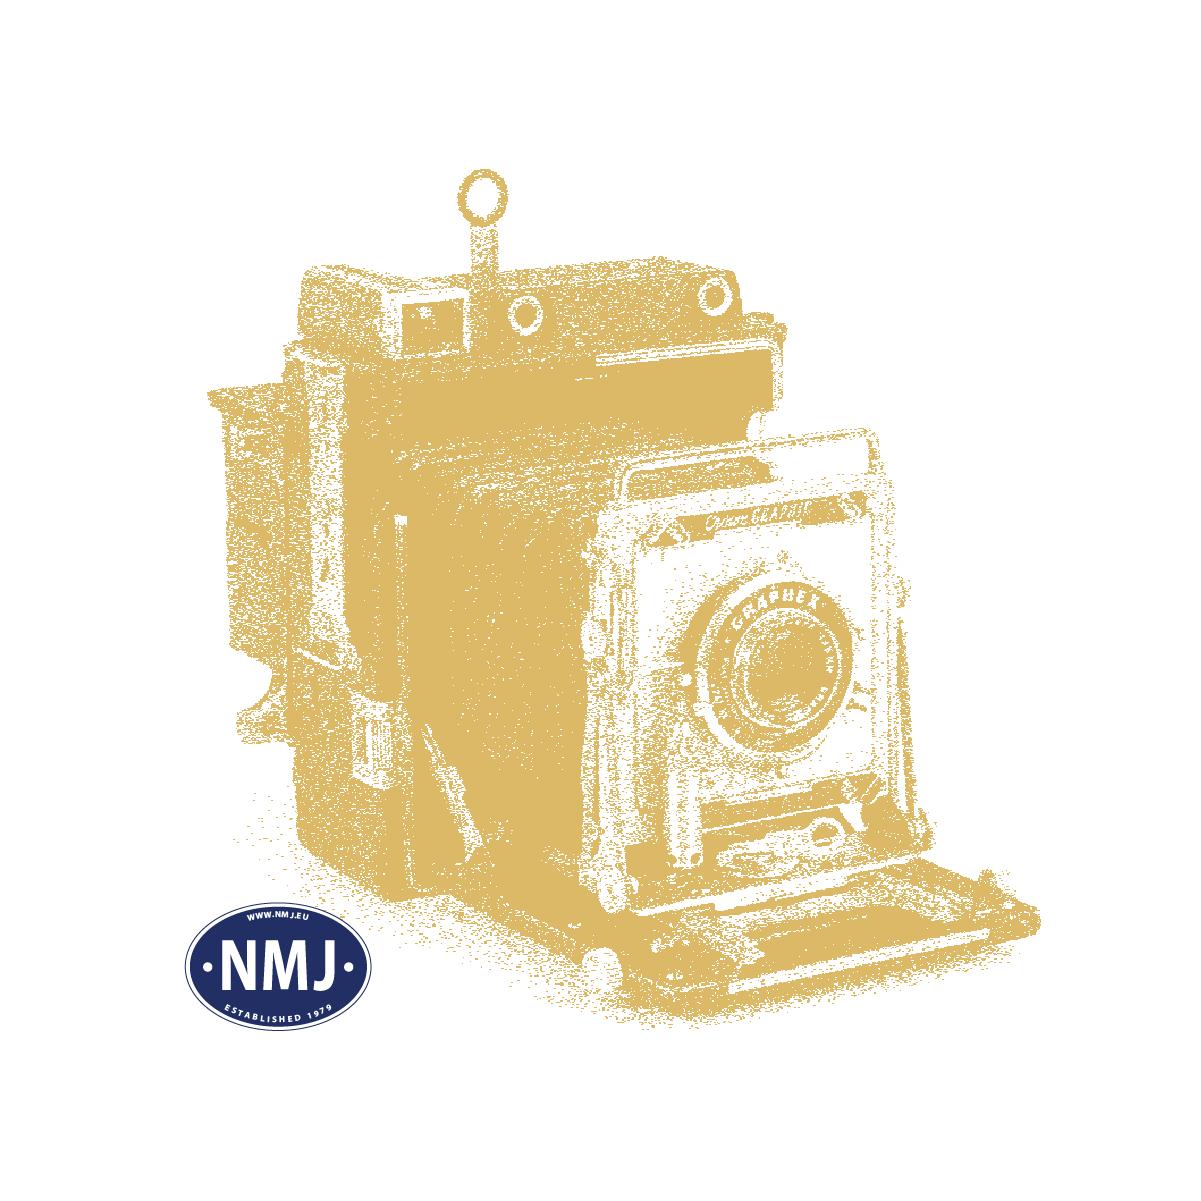 NMJT95405 - NMJ Topline SNCB 5206, AC Digital